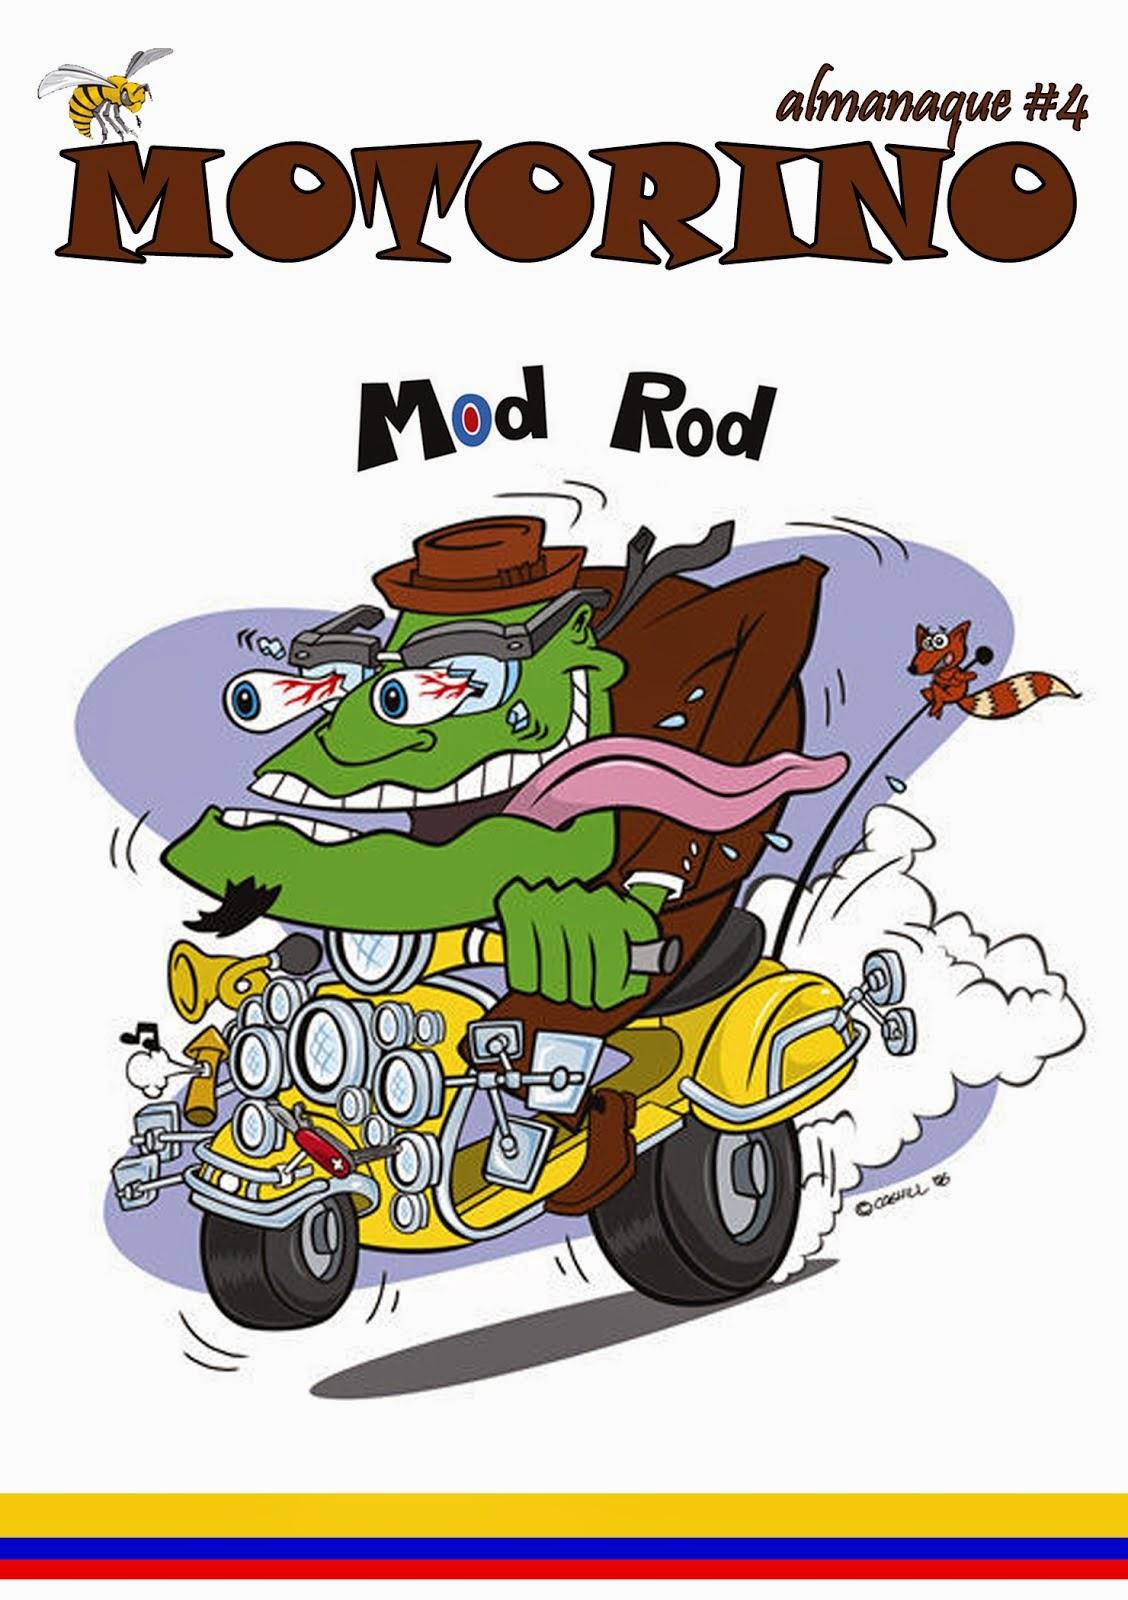 Almanaque MOTORINO #4 (Mod Rod)